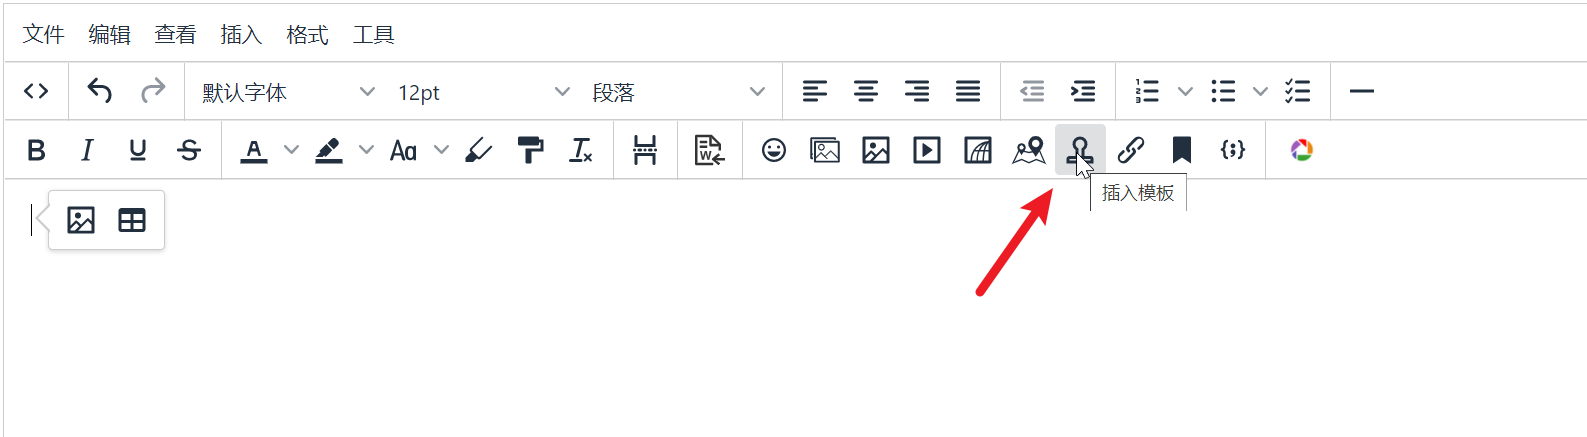 Zblog TinyMCE 富文本编辑器,分享,zblog教程,Zblog,主题模板,插件,Zblog插件,第4张